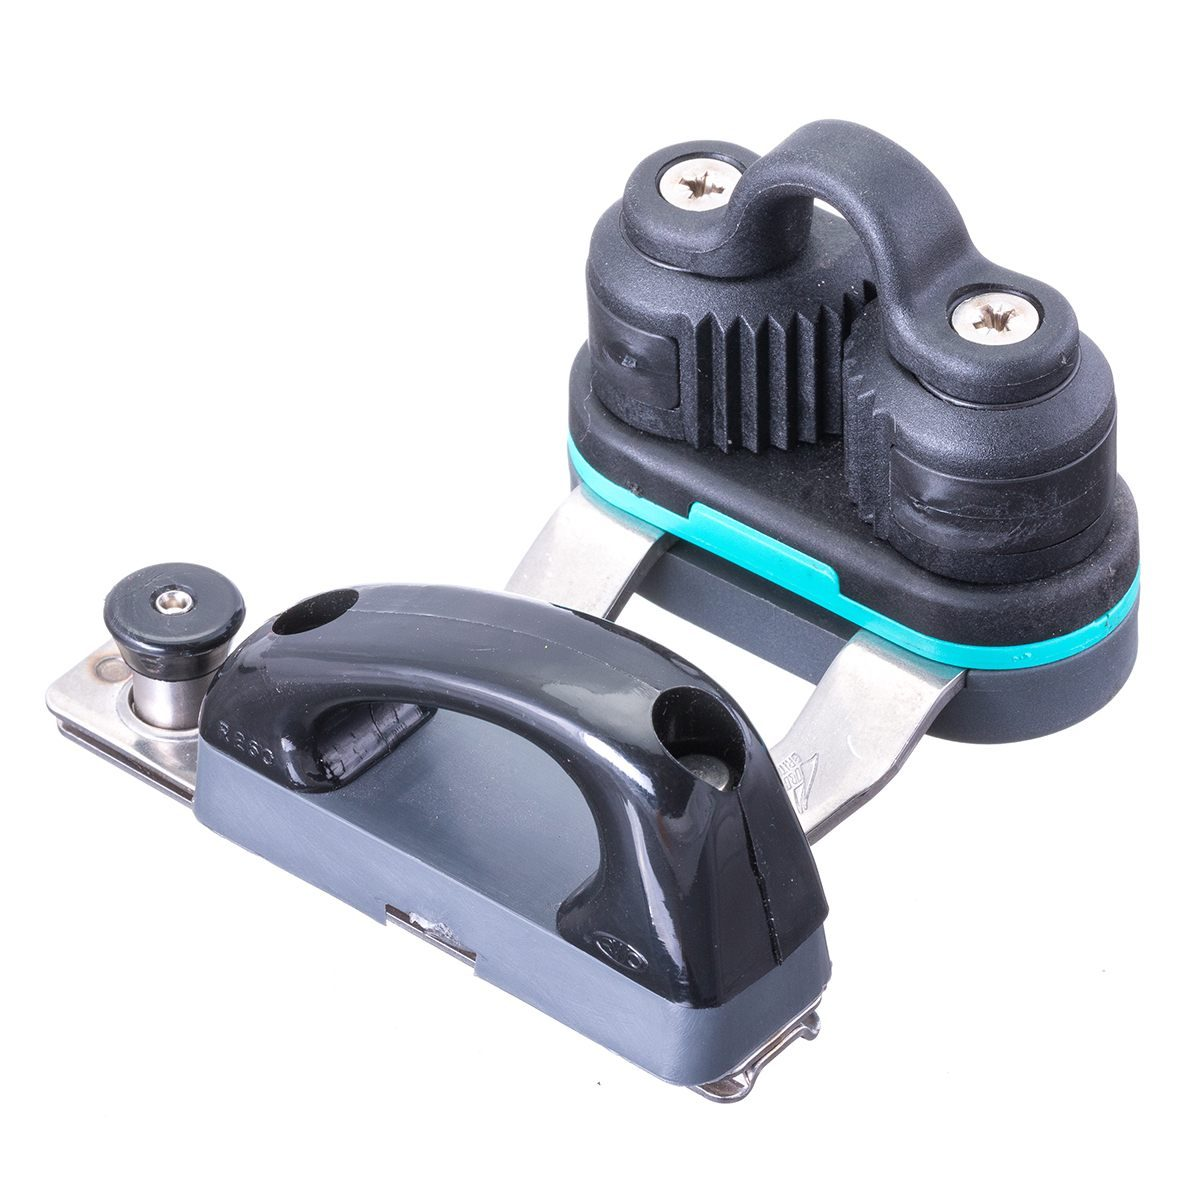 R2500 - Fairlead & Sw Cleat (Prs) (Pk Size: PR)